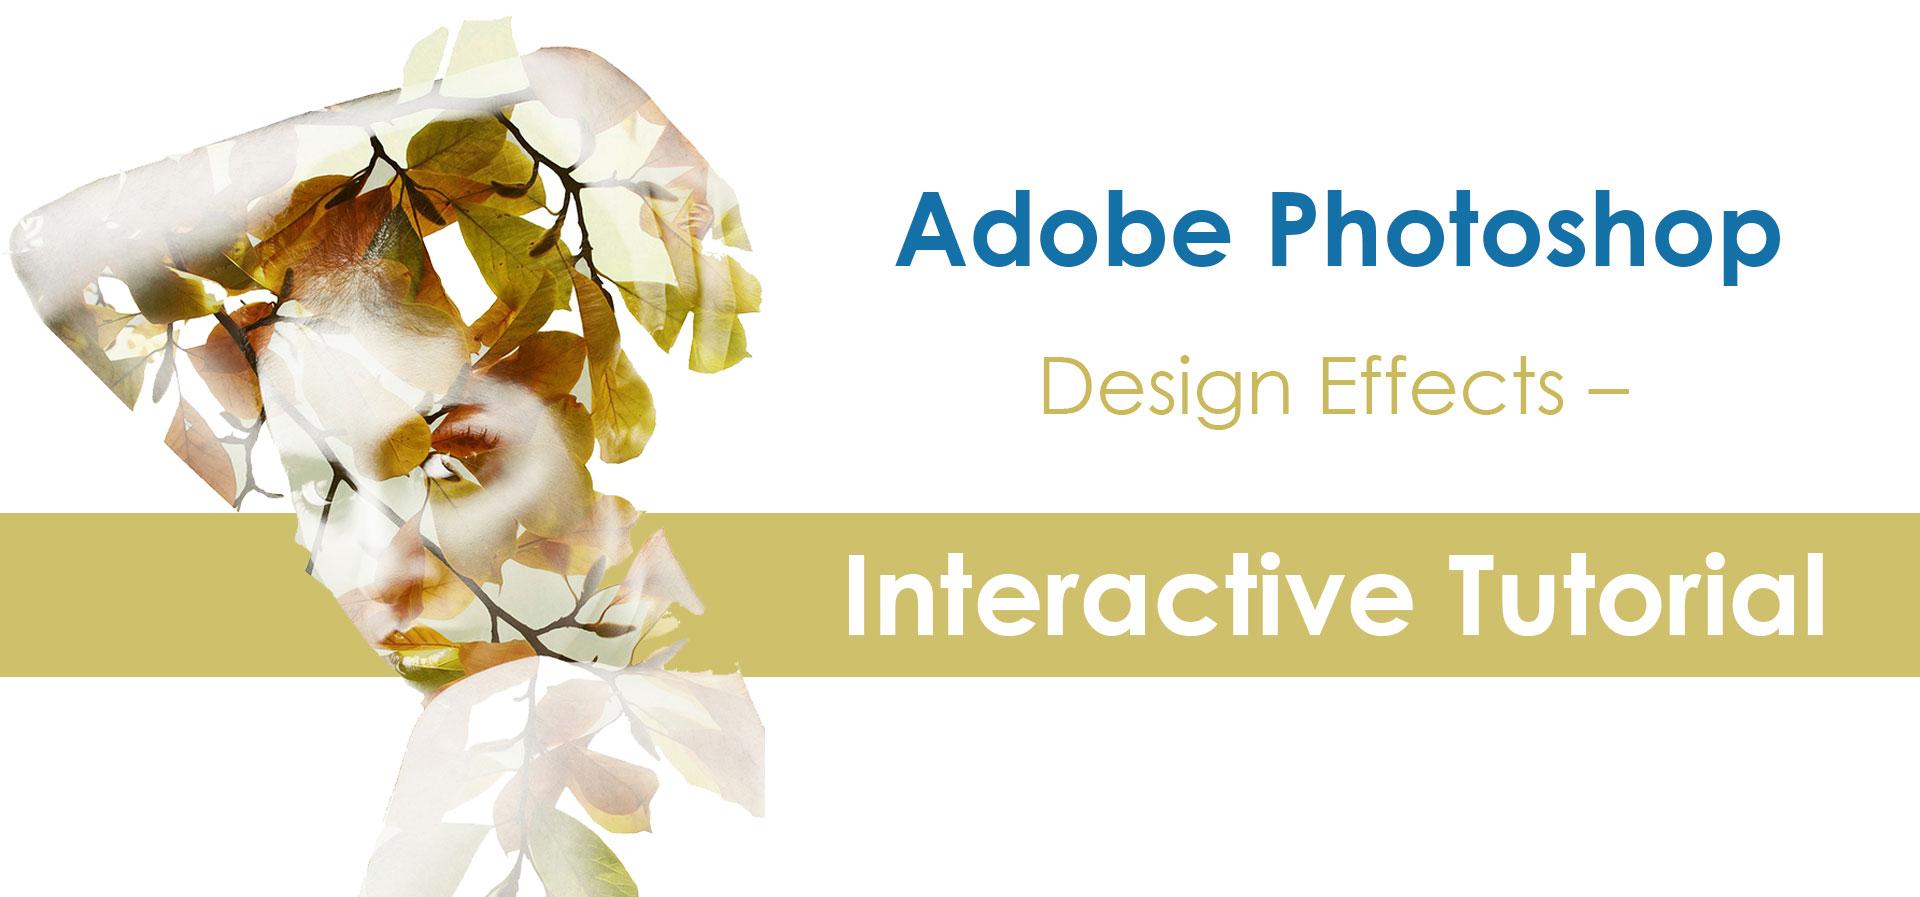 Adobe-Photoshop-Design-Effects-Interactive-Tutorial